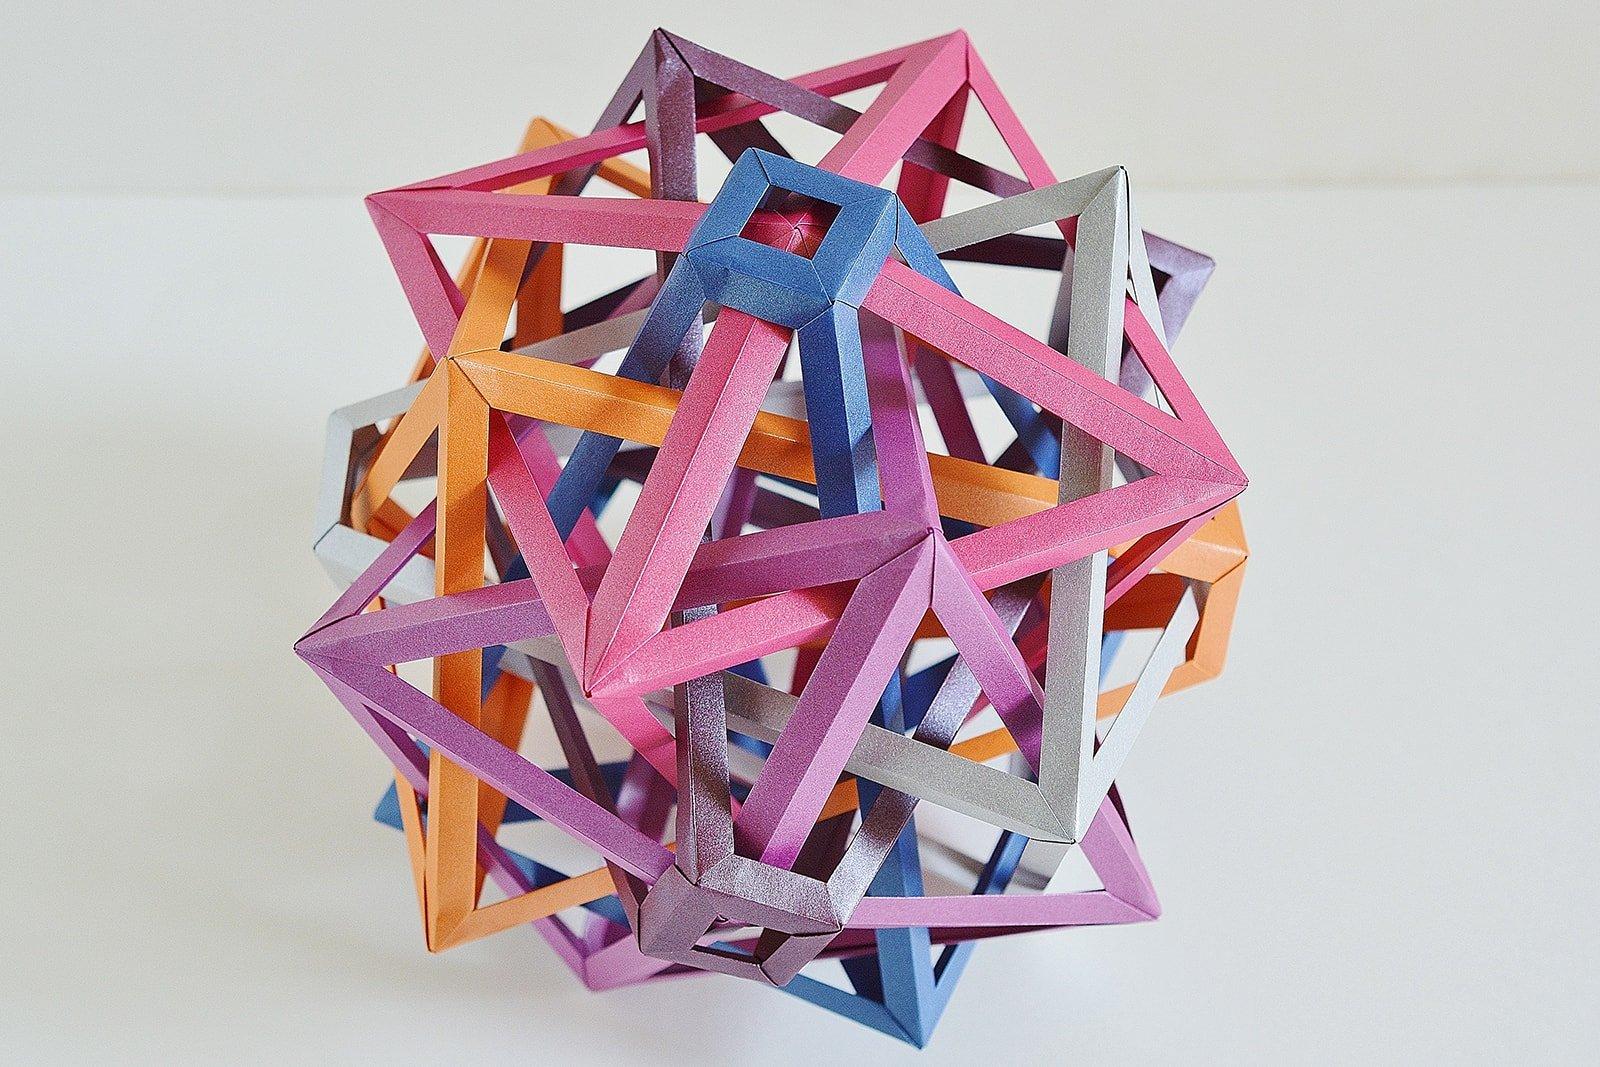 87+ Complex Modular Origami - Origami Boat Instructions ... - photo#5